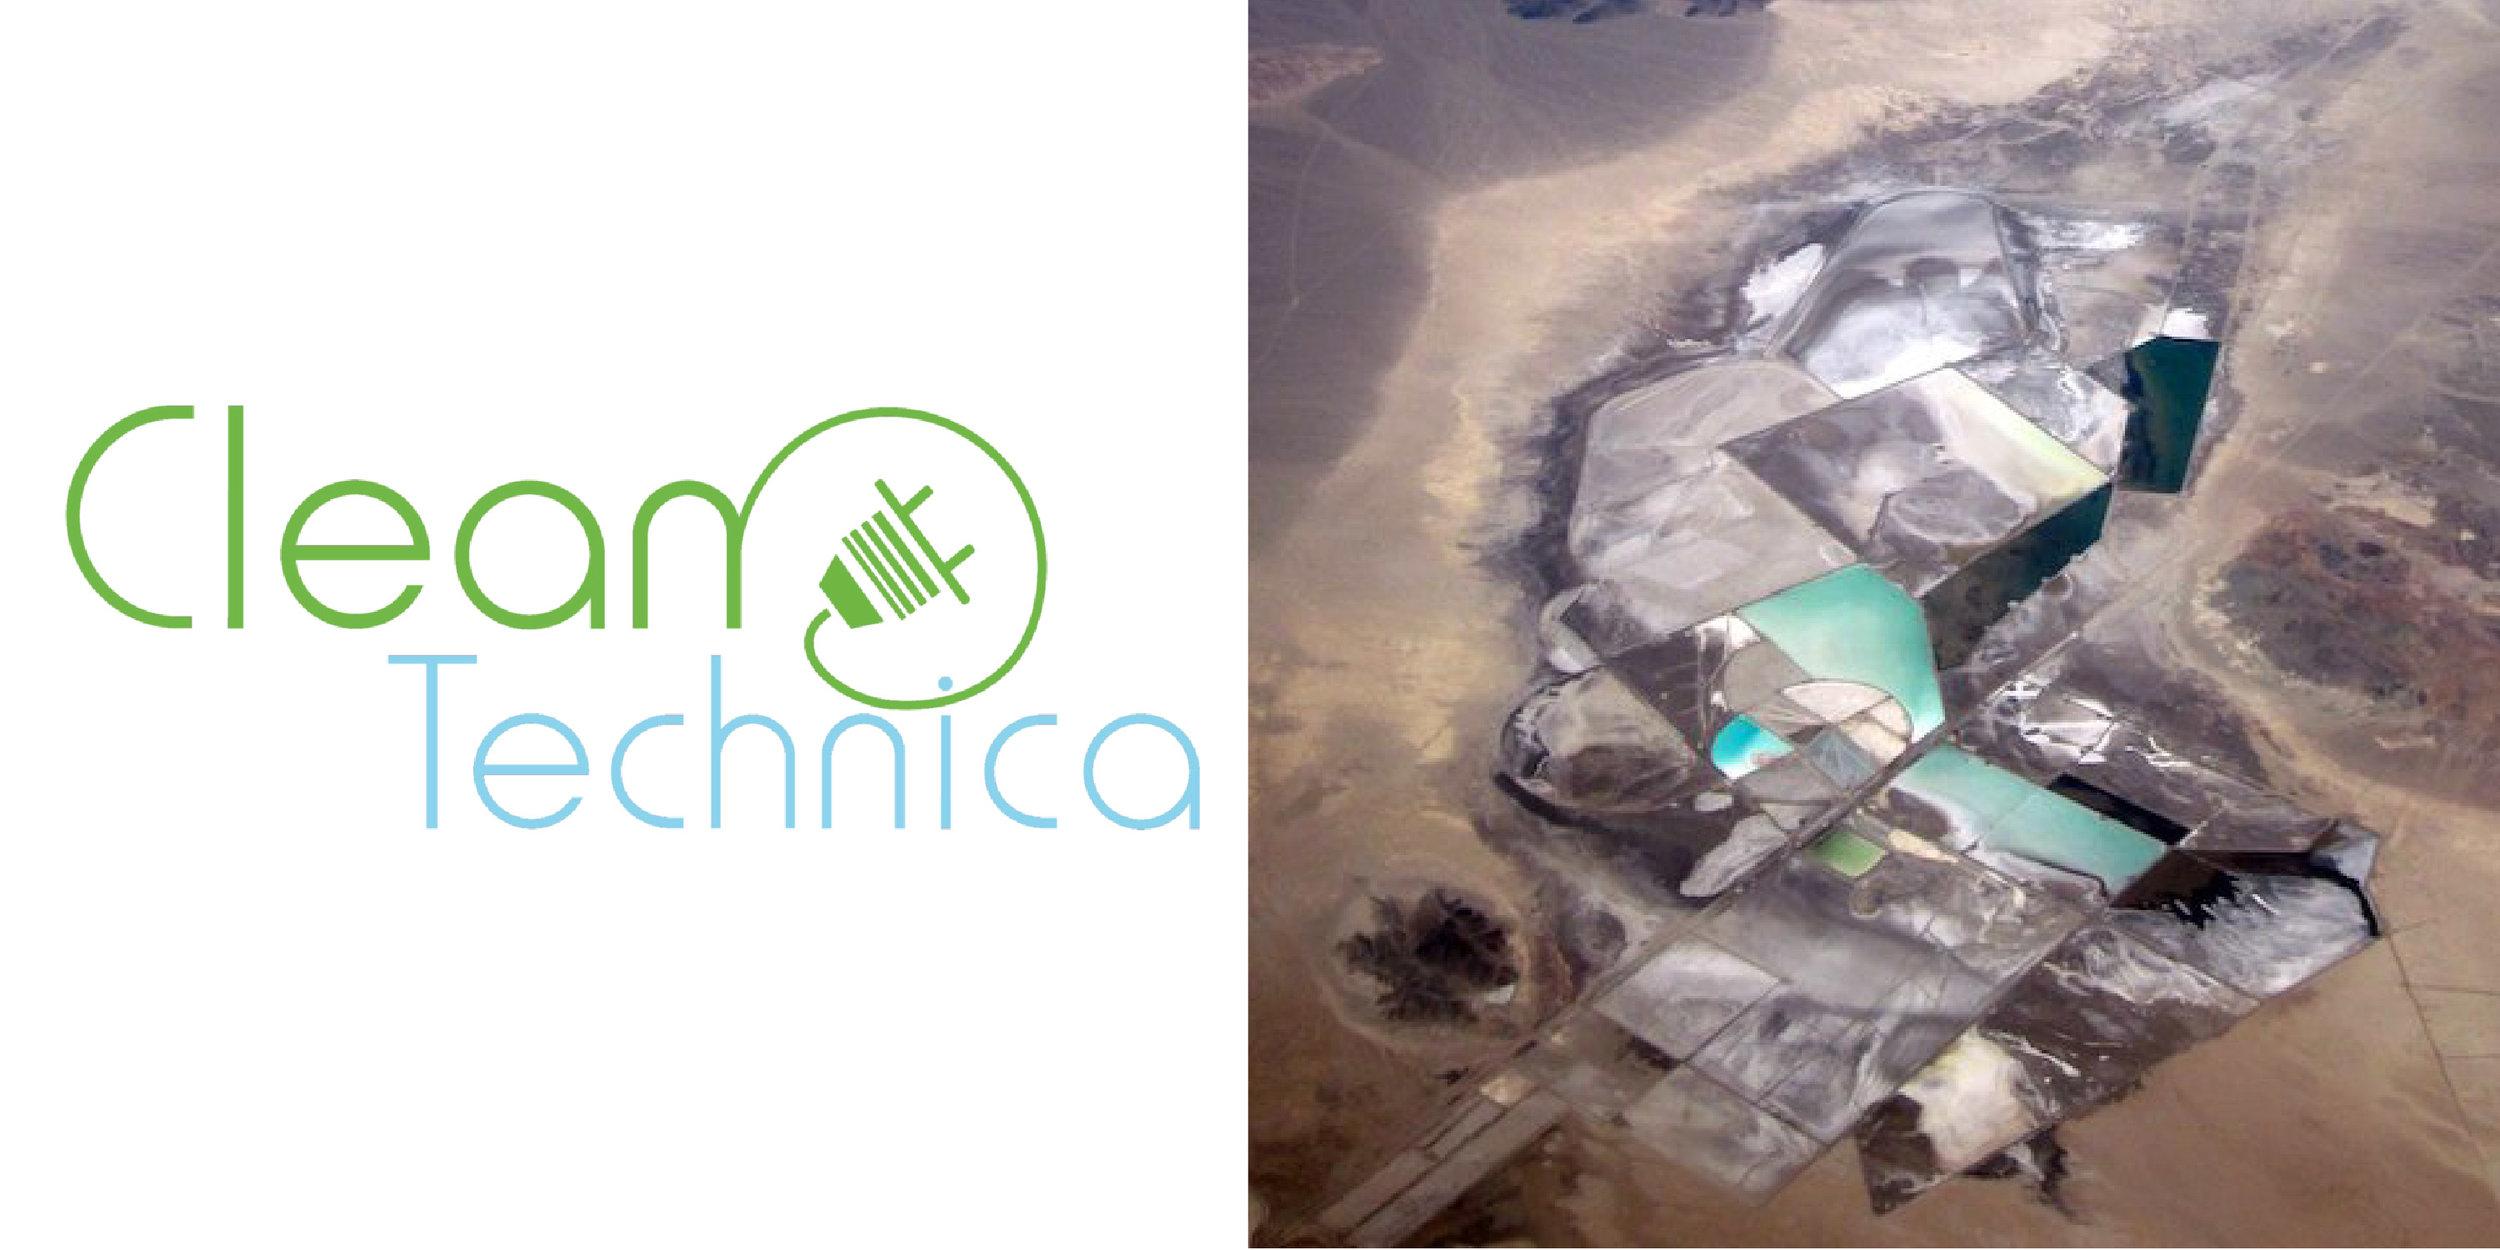 Lilac Clean Tecnica Piece-01.jpg